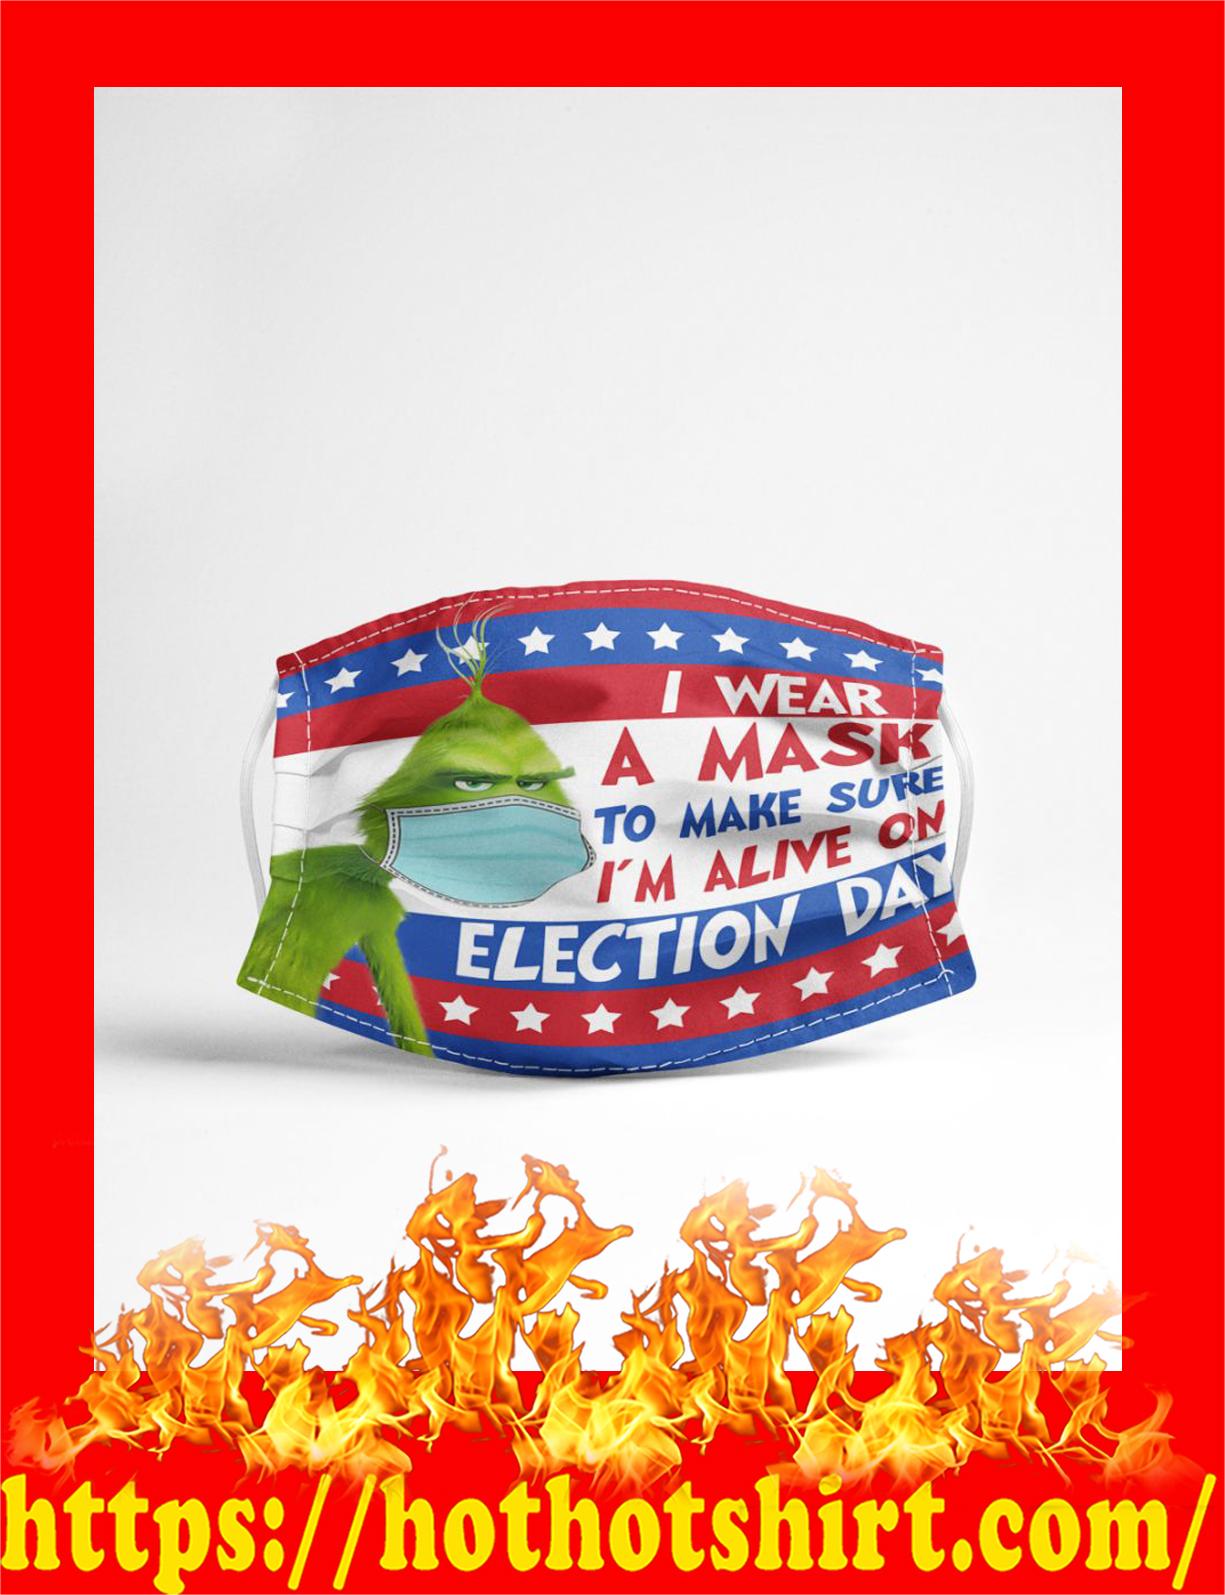 Face mask I wear a mask to make sure i'm alive on election day - detail